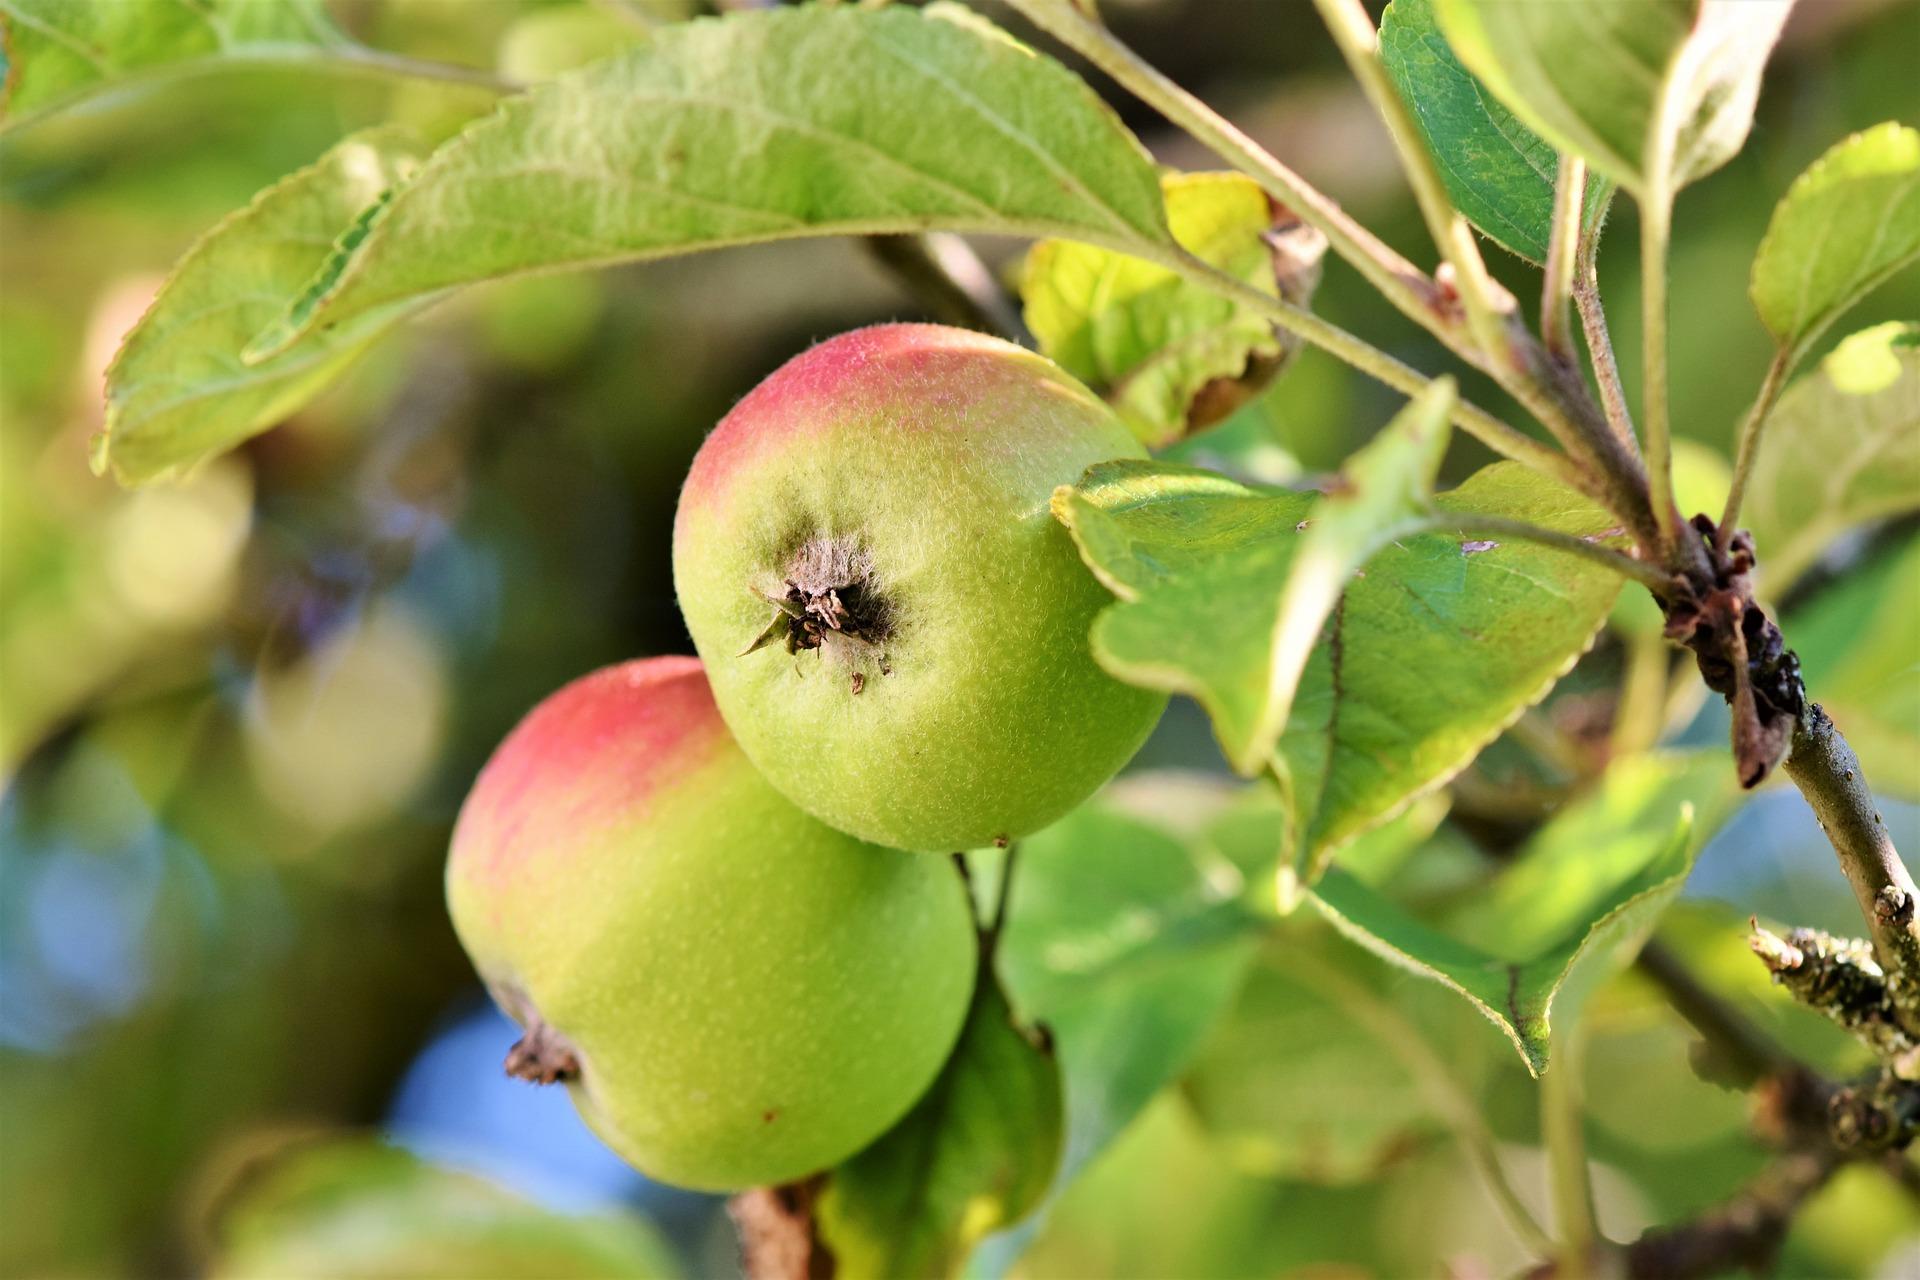 apple-3524113_1920.jpg